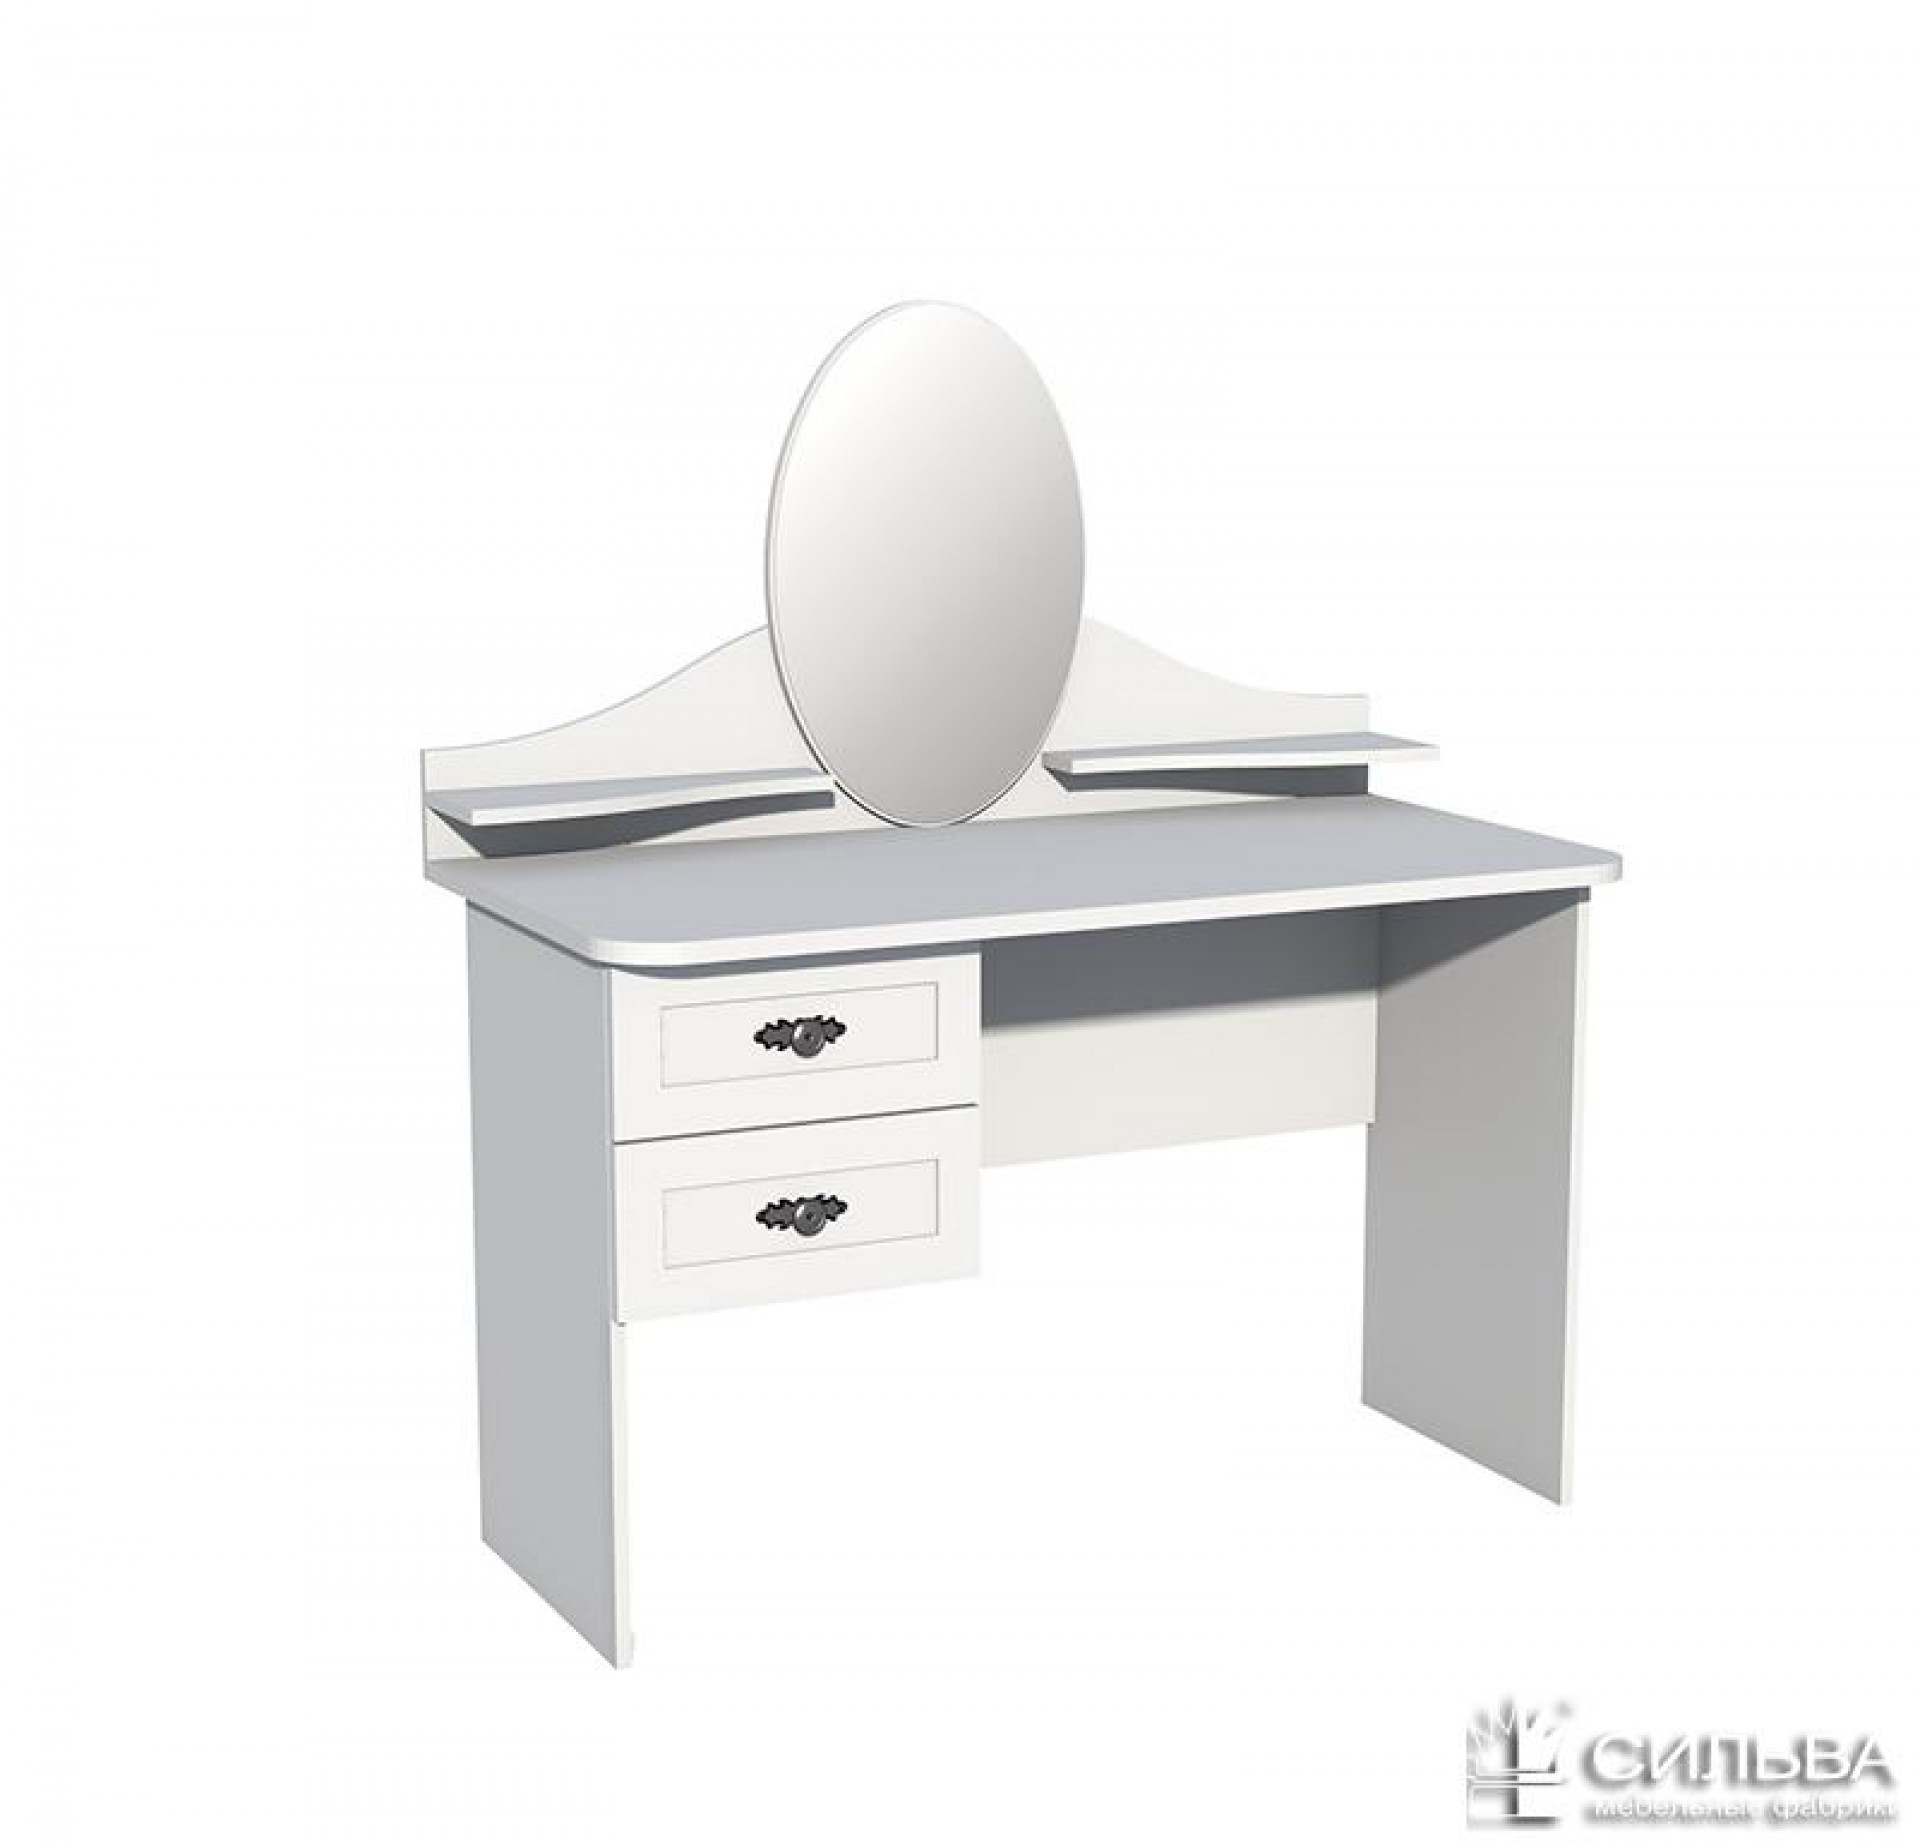 Стол туалетный 2-01 «Прованс» НМ 011.09-01